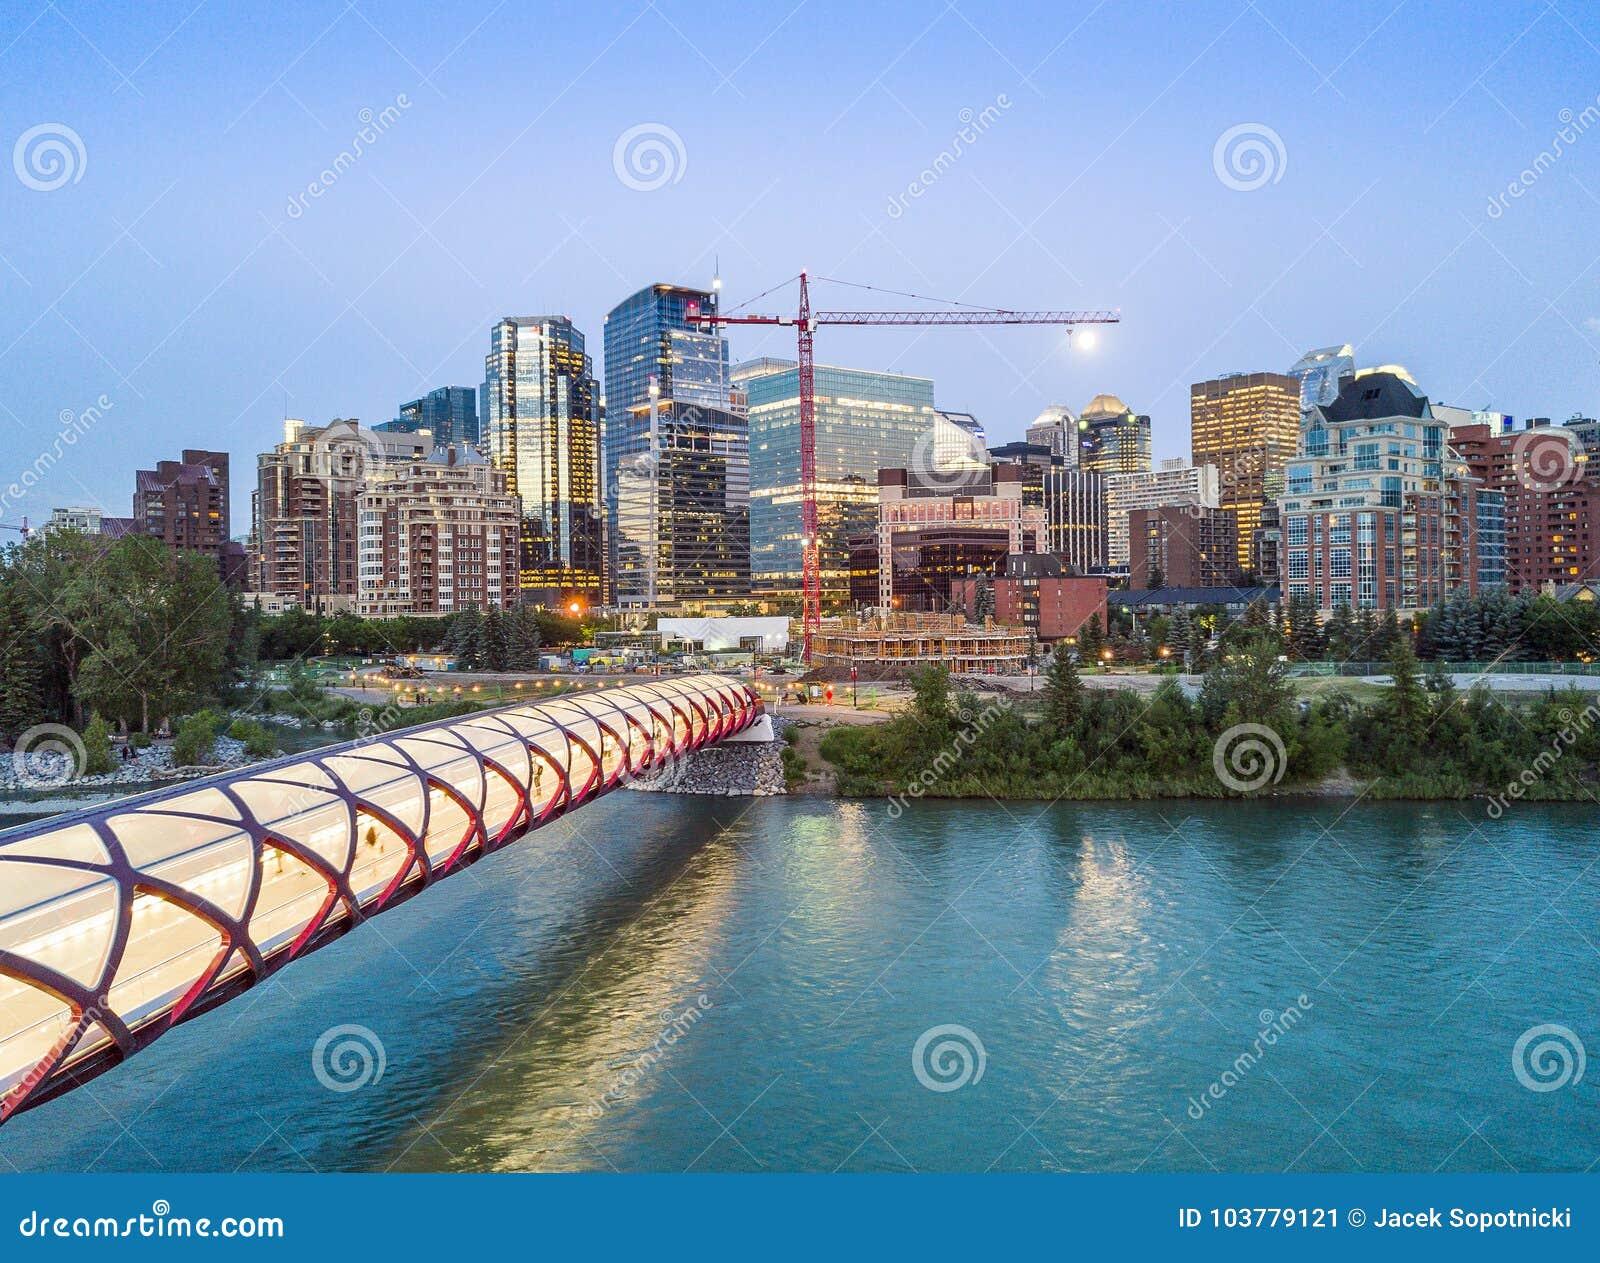 Calgary du centre avec le pont iluminated de paix, Alberta, Canada